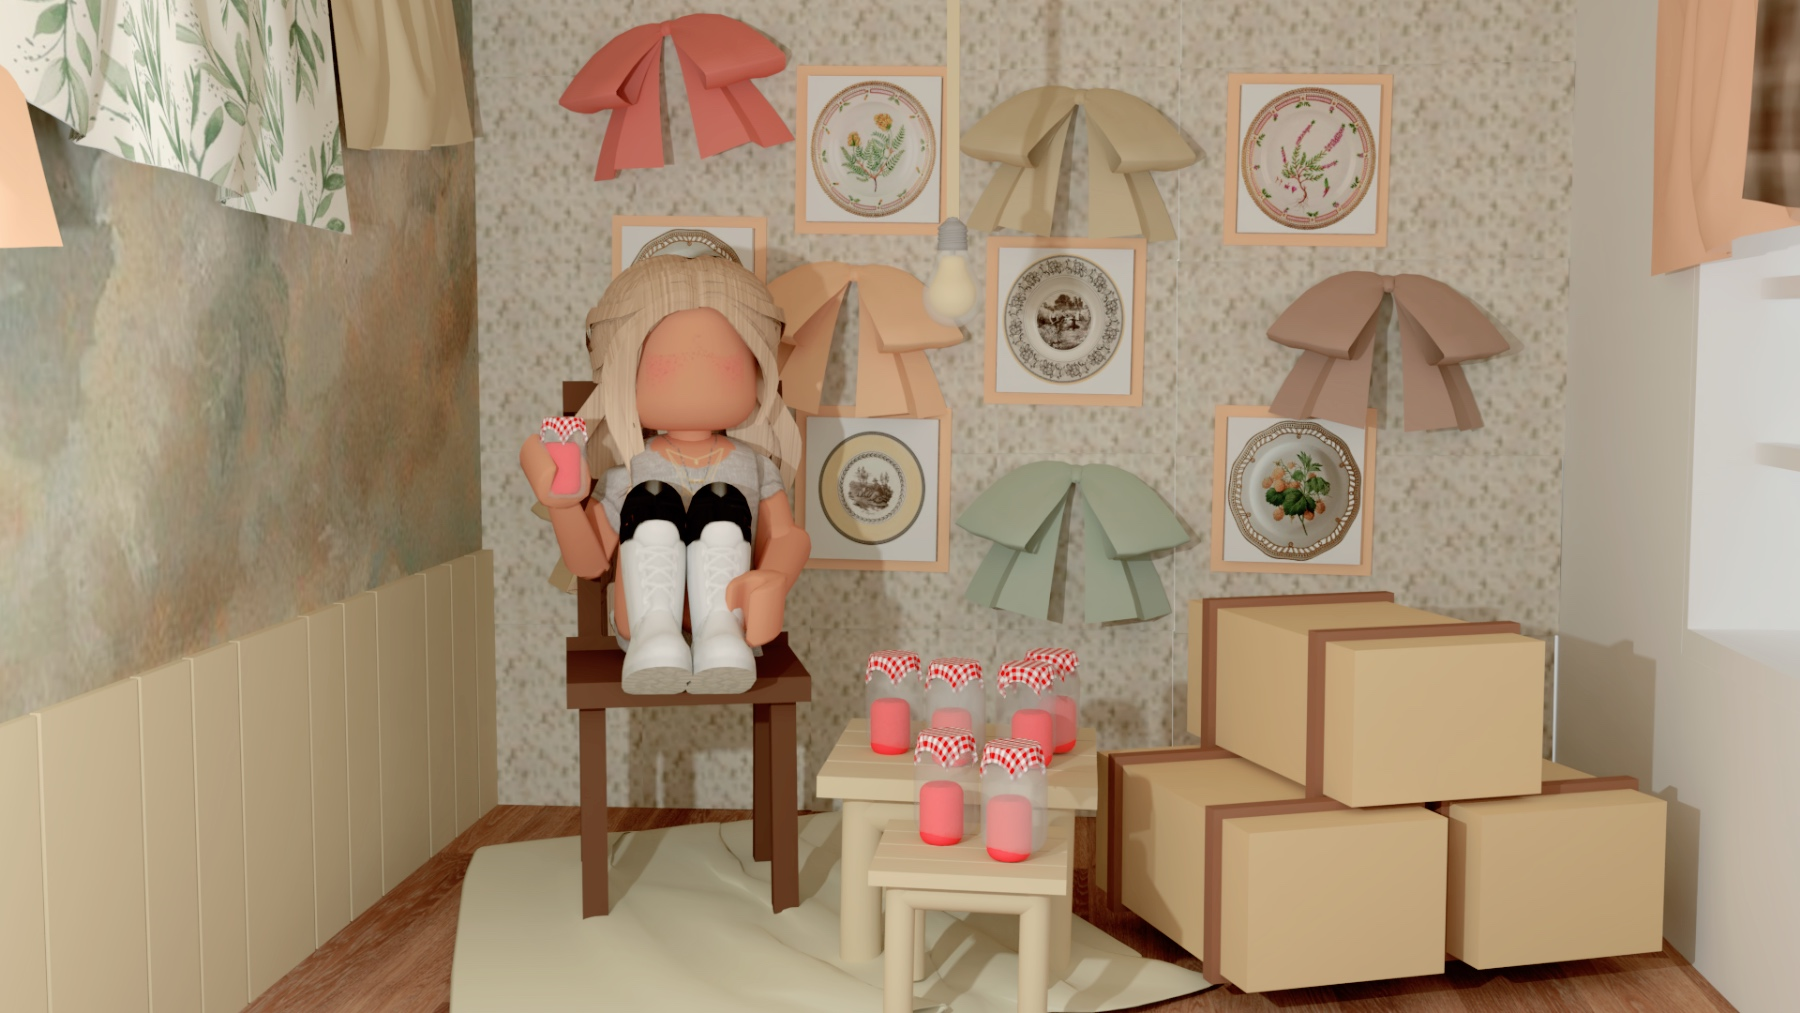 Roblox Gfx Jam Room In 2020 Roblox Cute Tumblr Wallpaper Roblox Animation